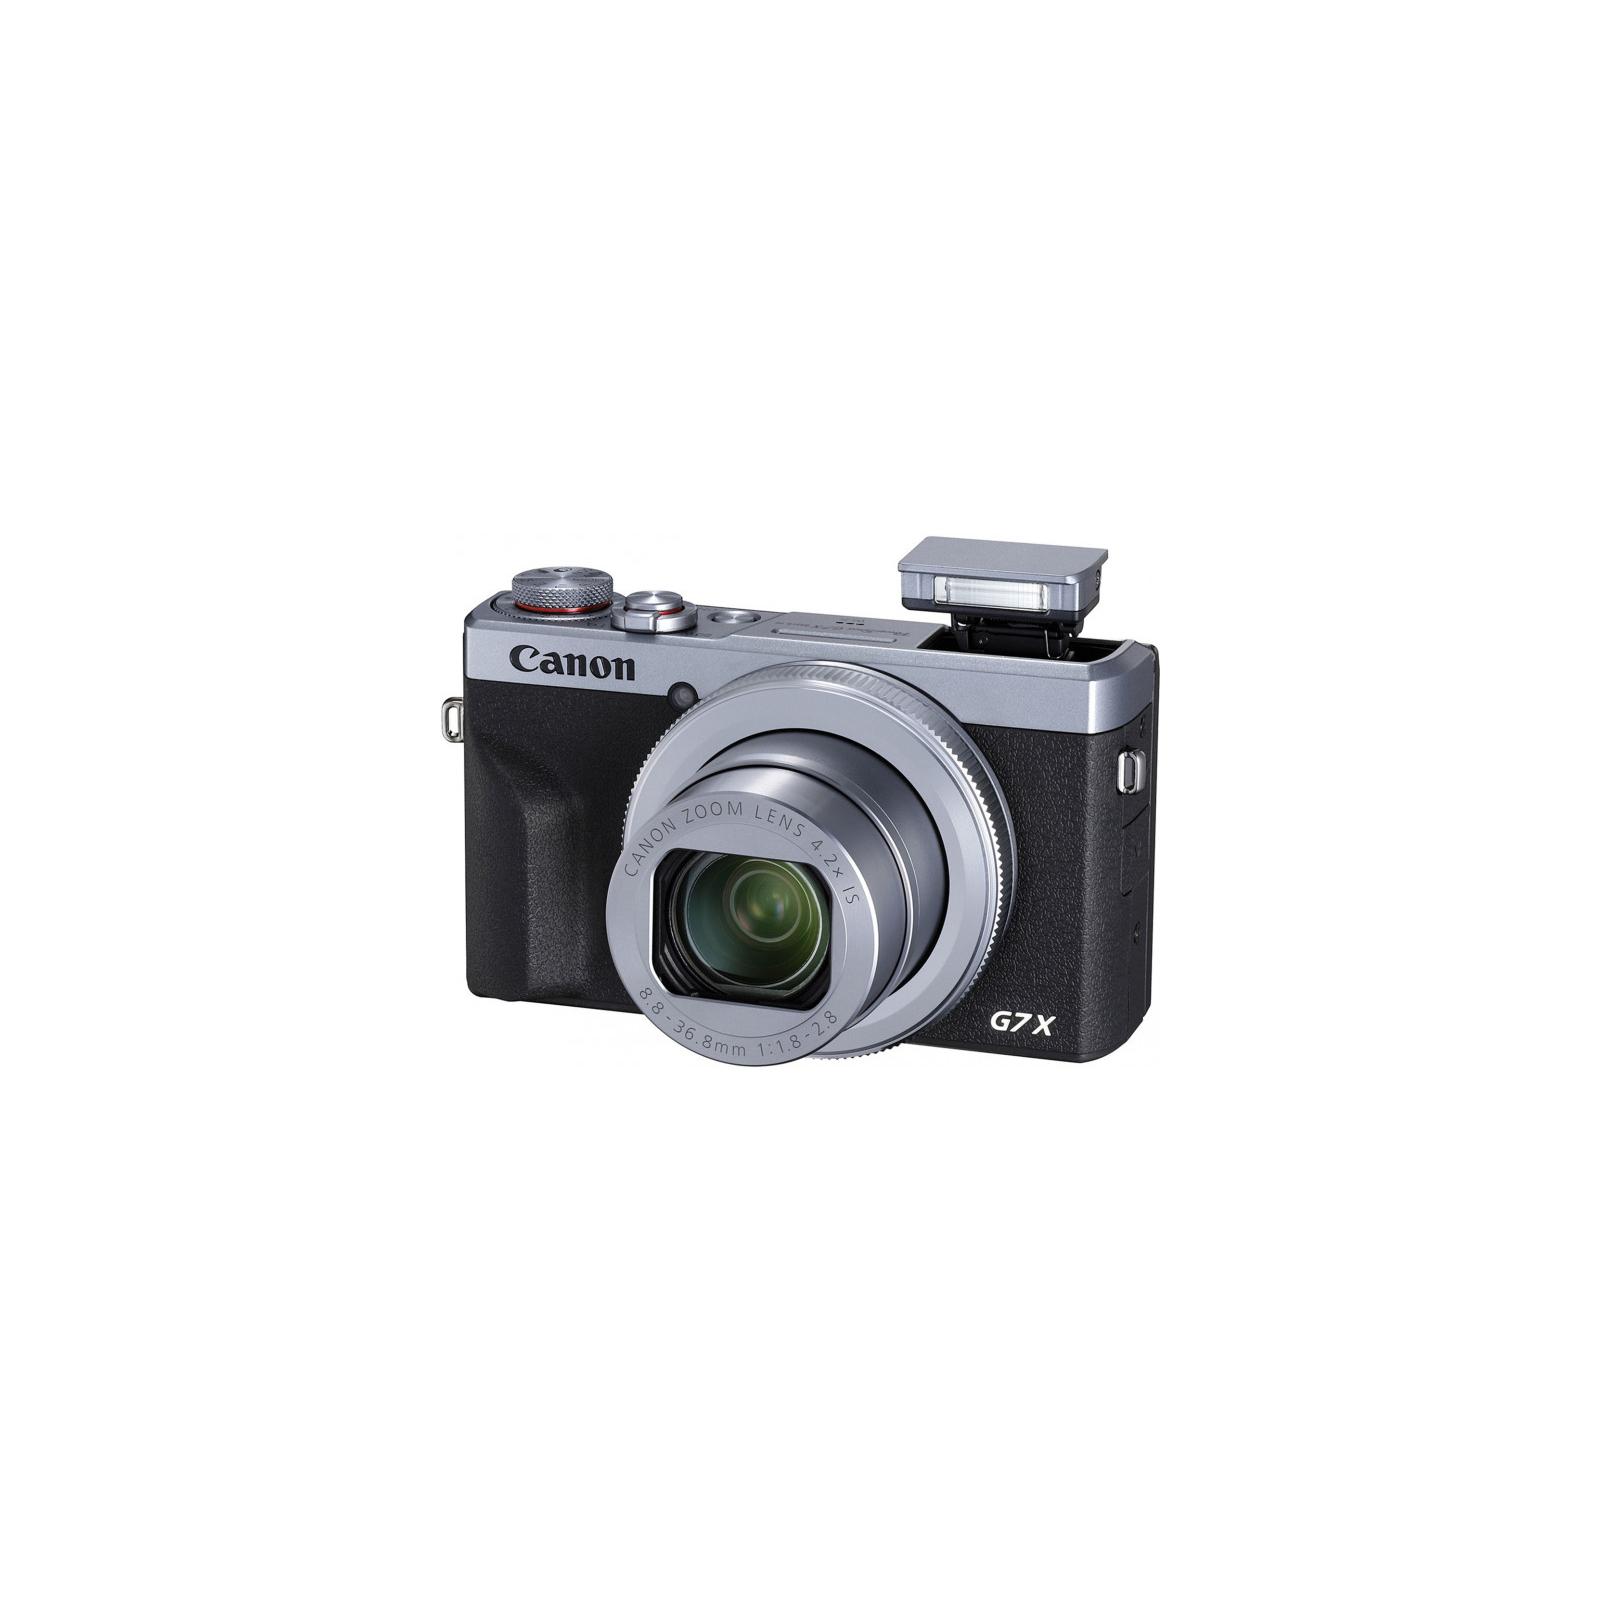 Цифровой фотоаппарат Canon Powershot G7 X Mark III Black (3637C013) изображение 2